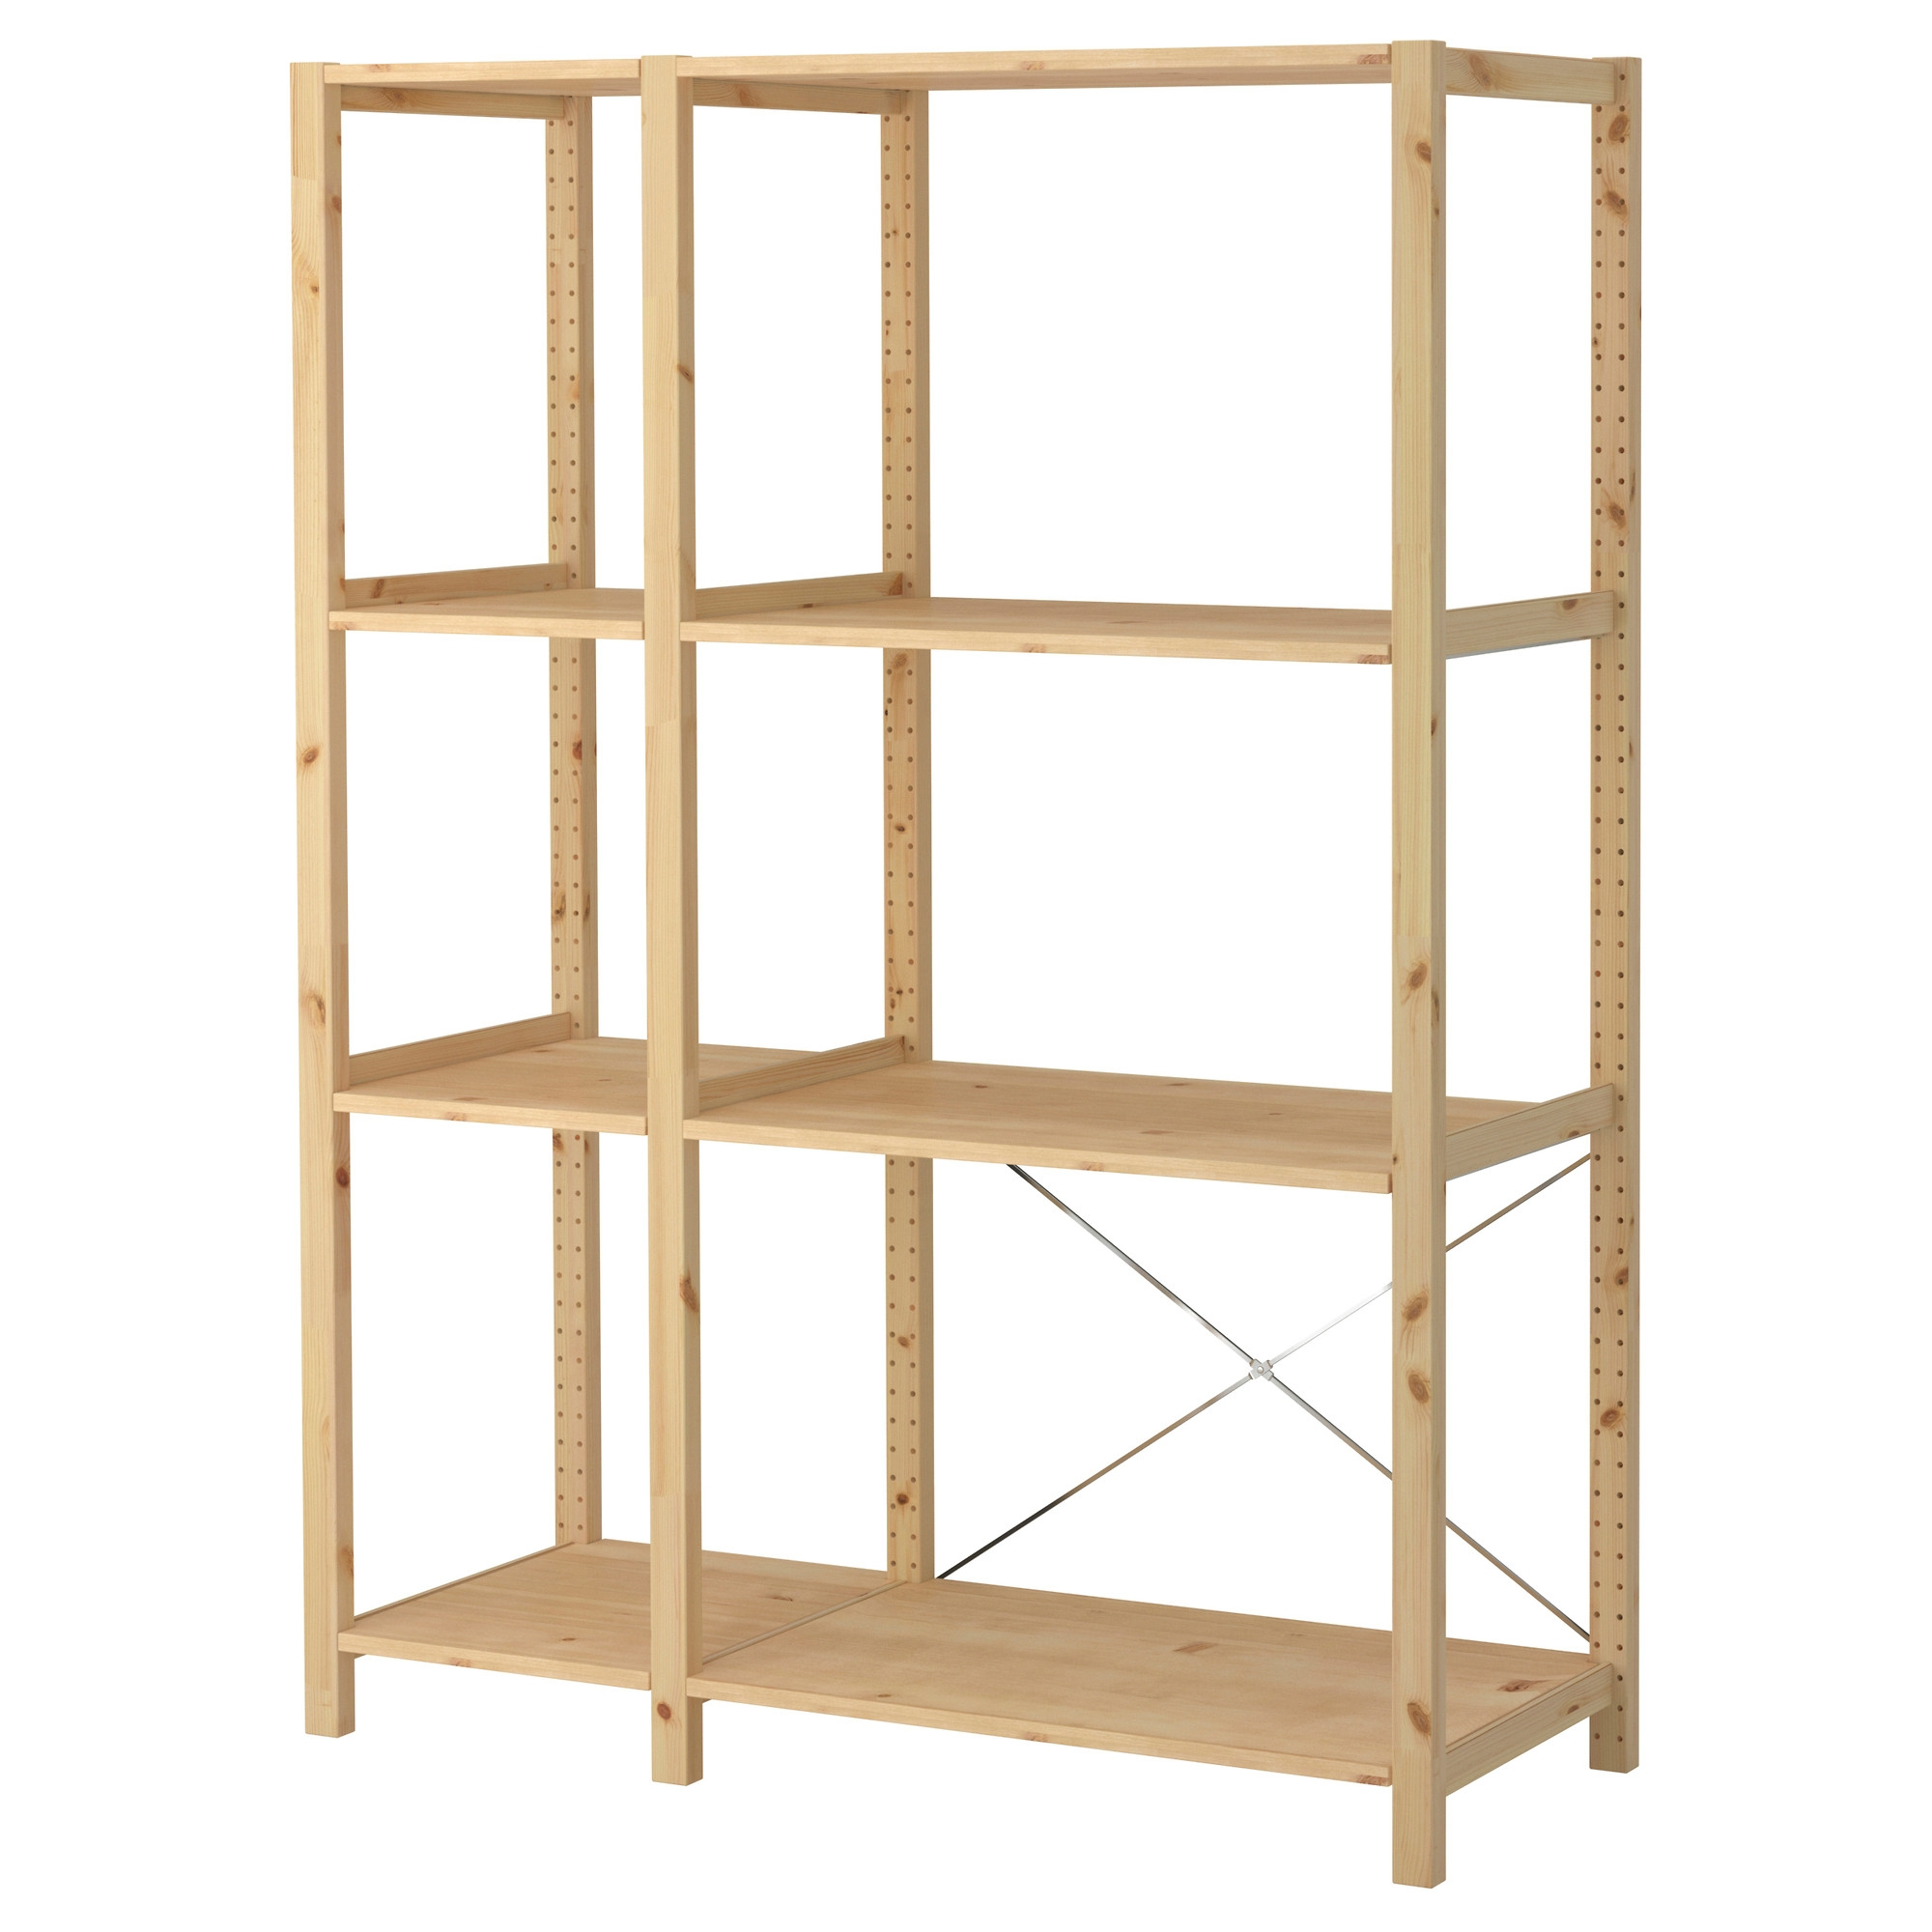 Ivar 2 Section Shelving Unit 52 34×19 58×70 12 Ikea Inside Wooden Shelving Units (#8 of 15)